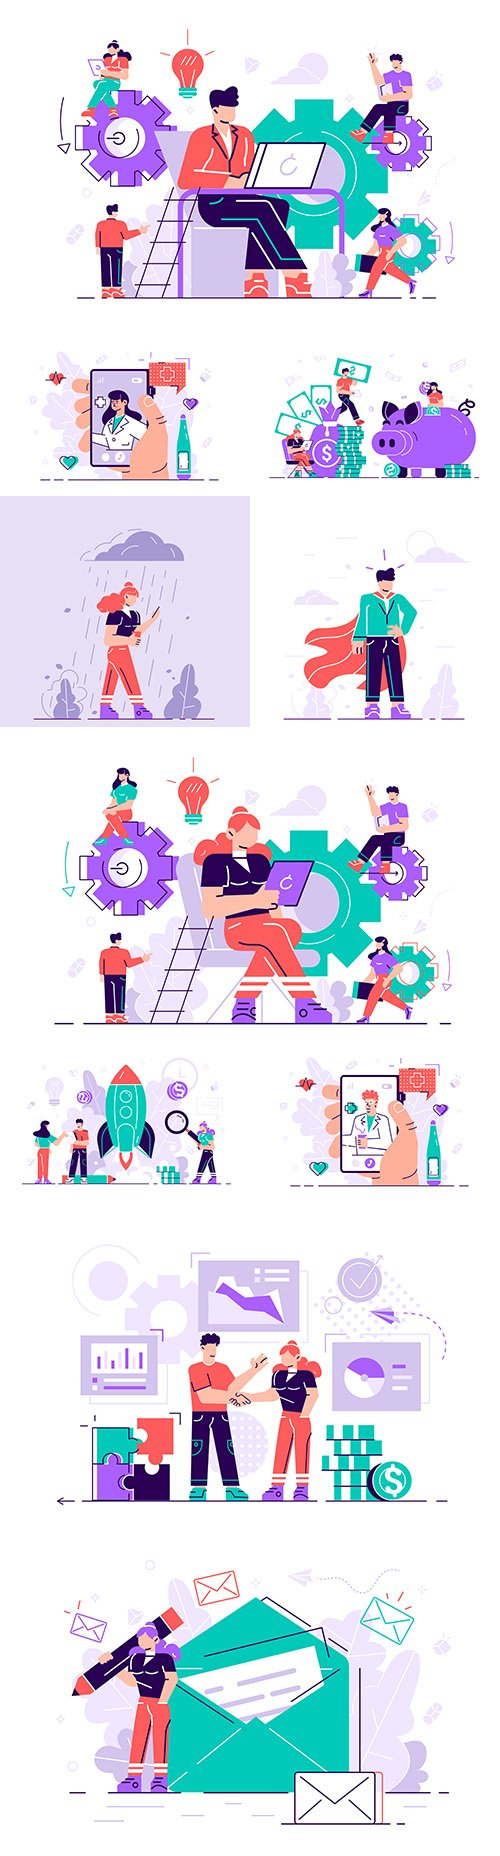 People business concept flat design illustration